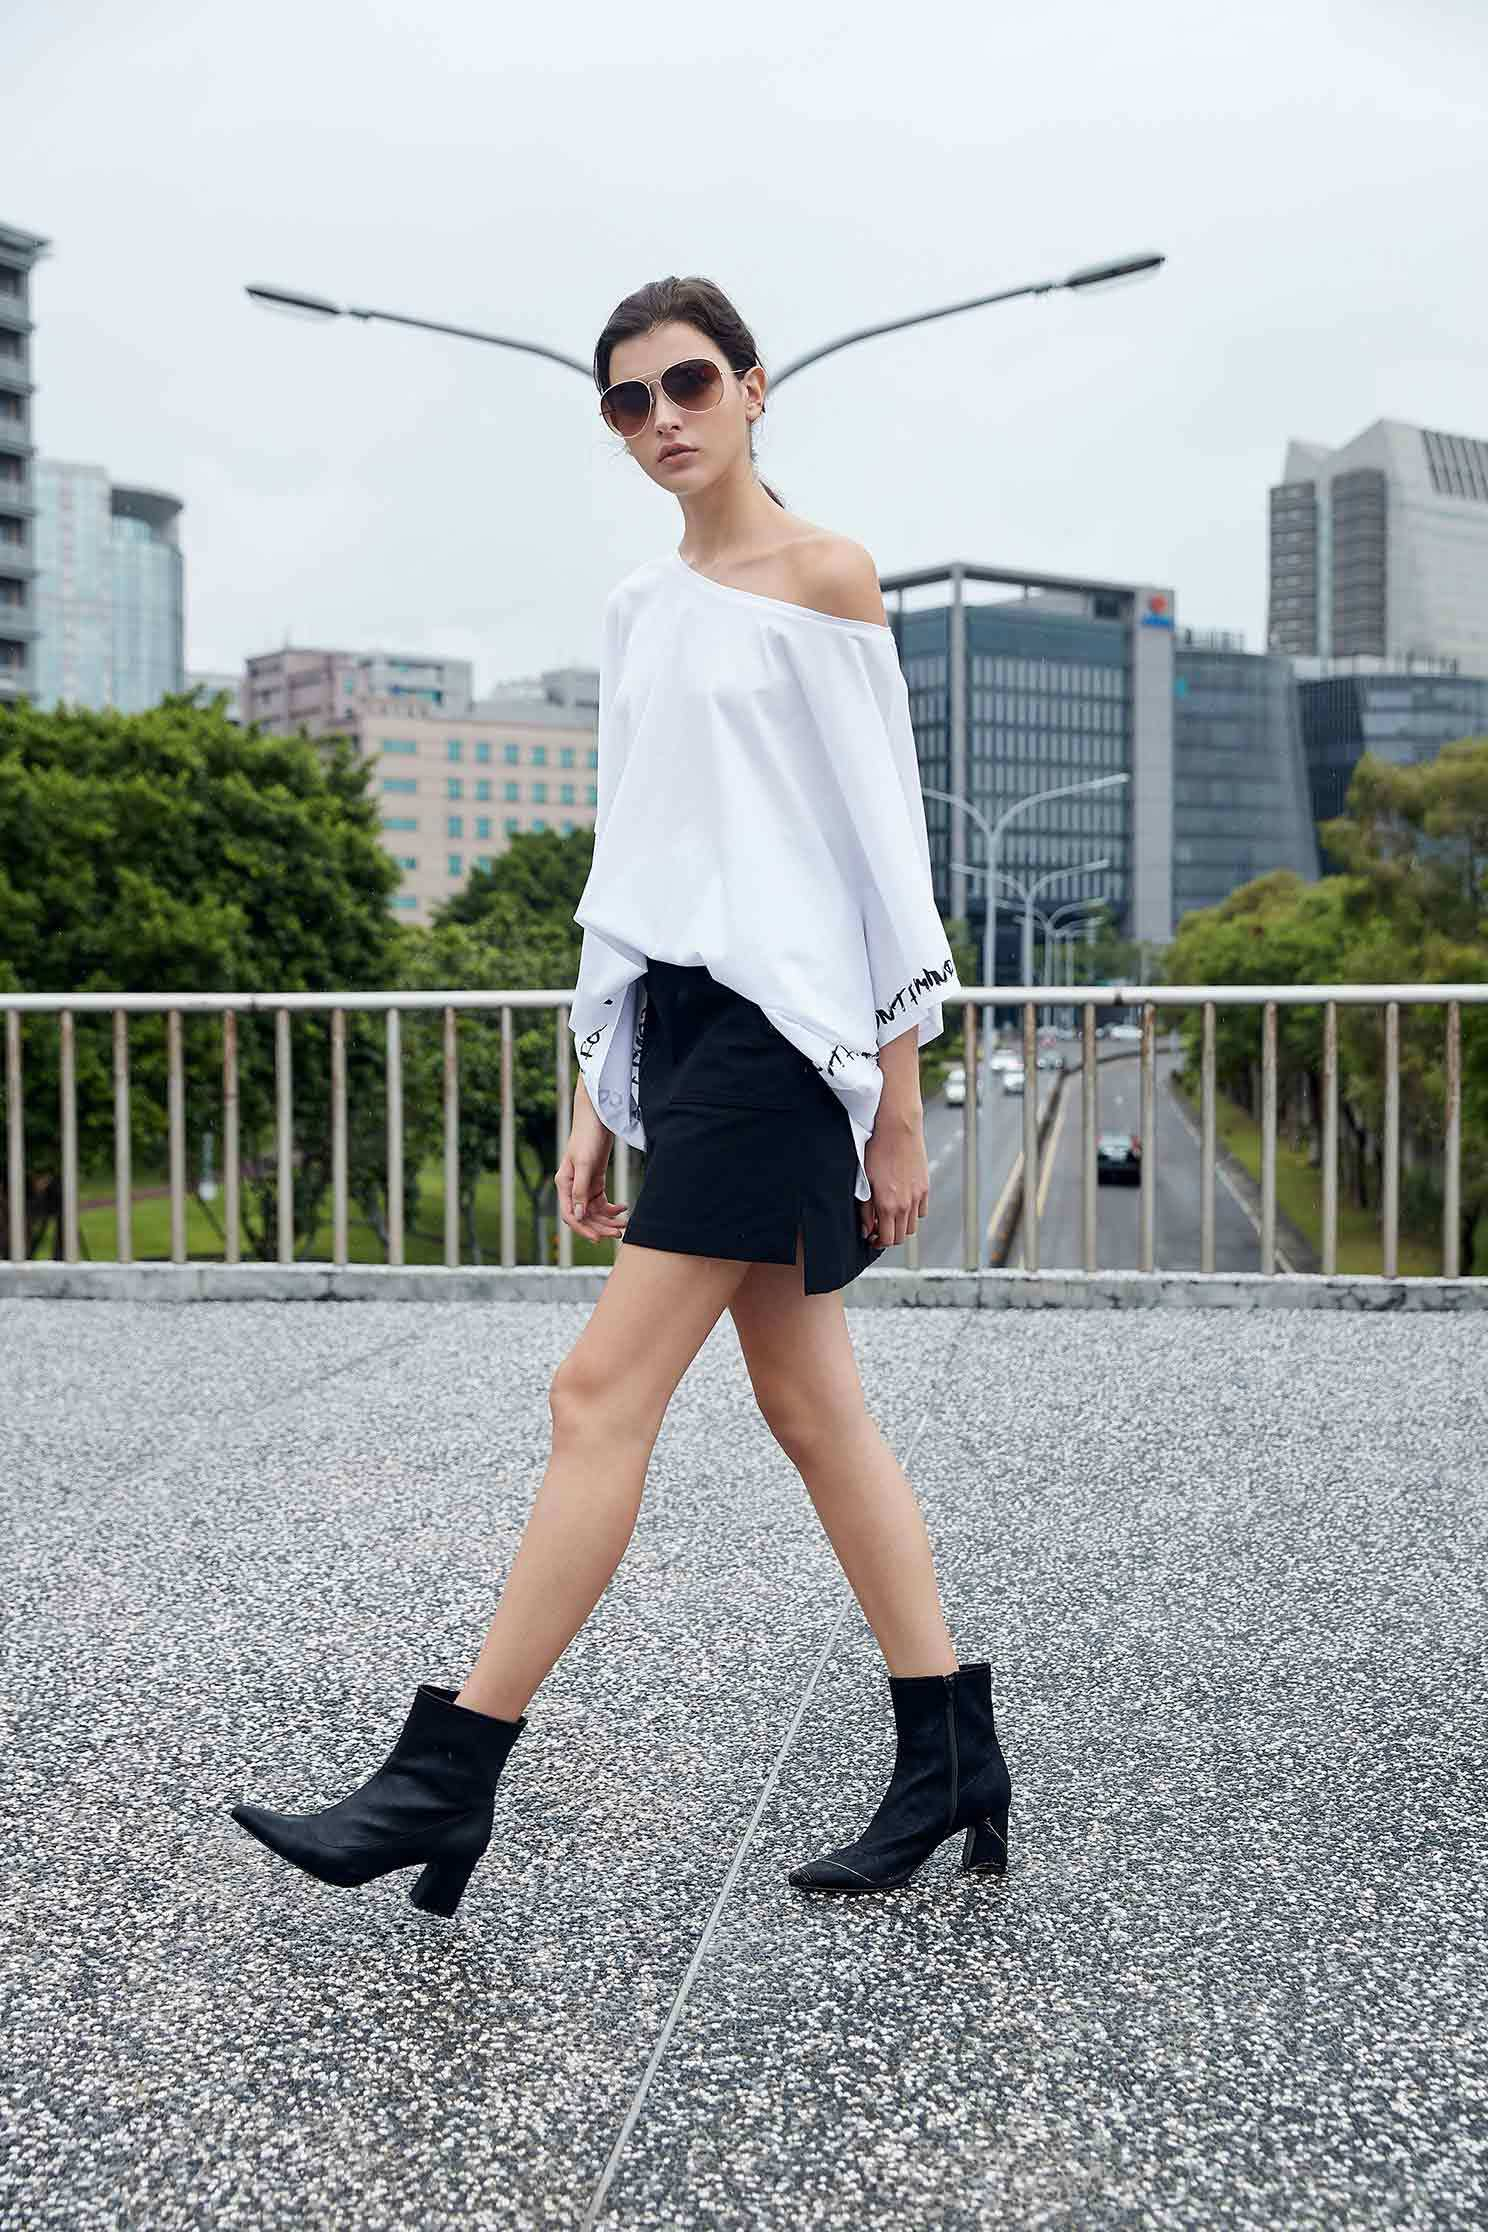 Well-matched basic A line skirt,A-line skirt,Mini Skirt,黑色裙子